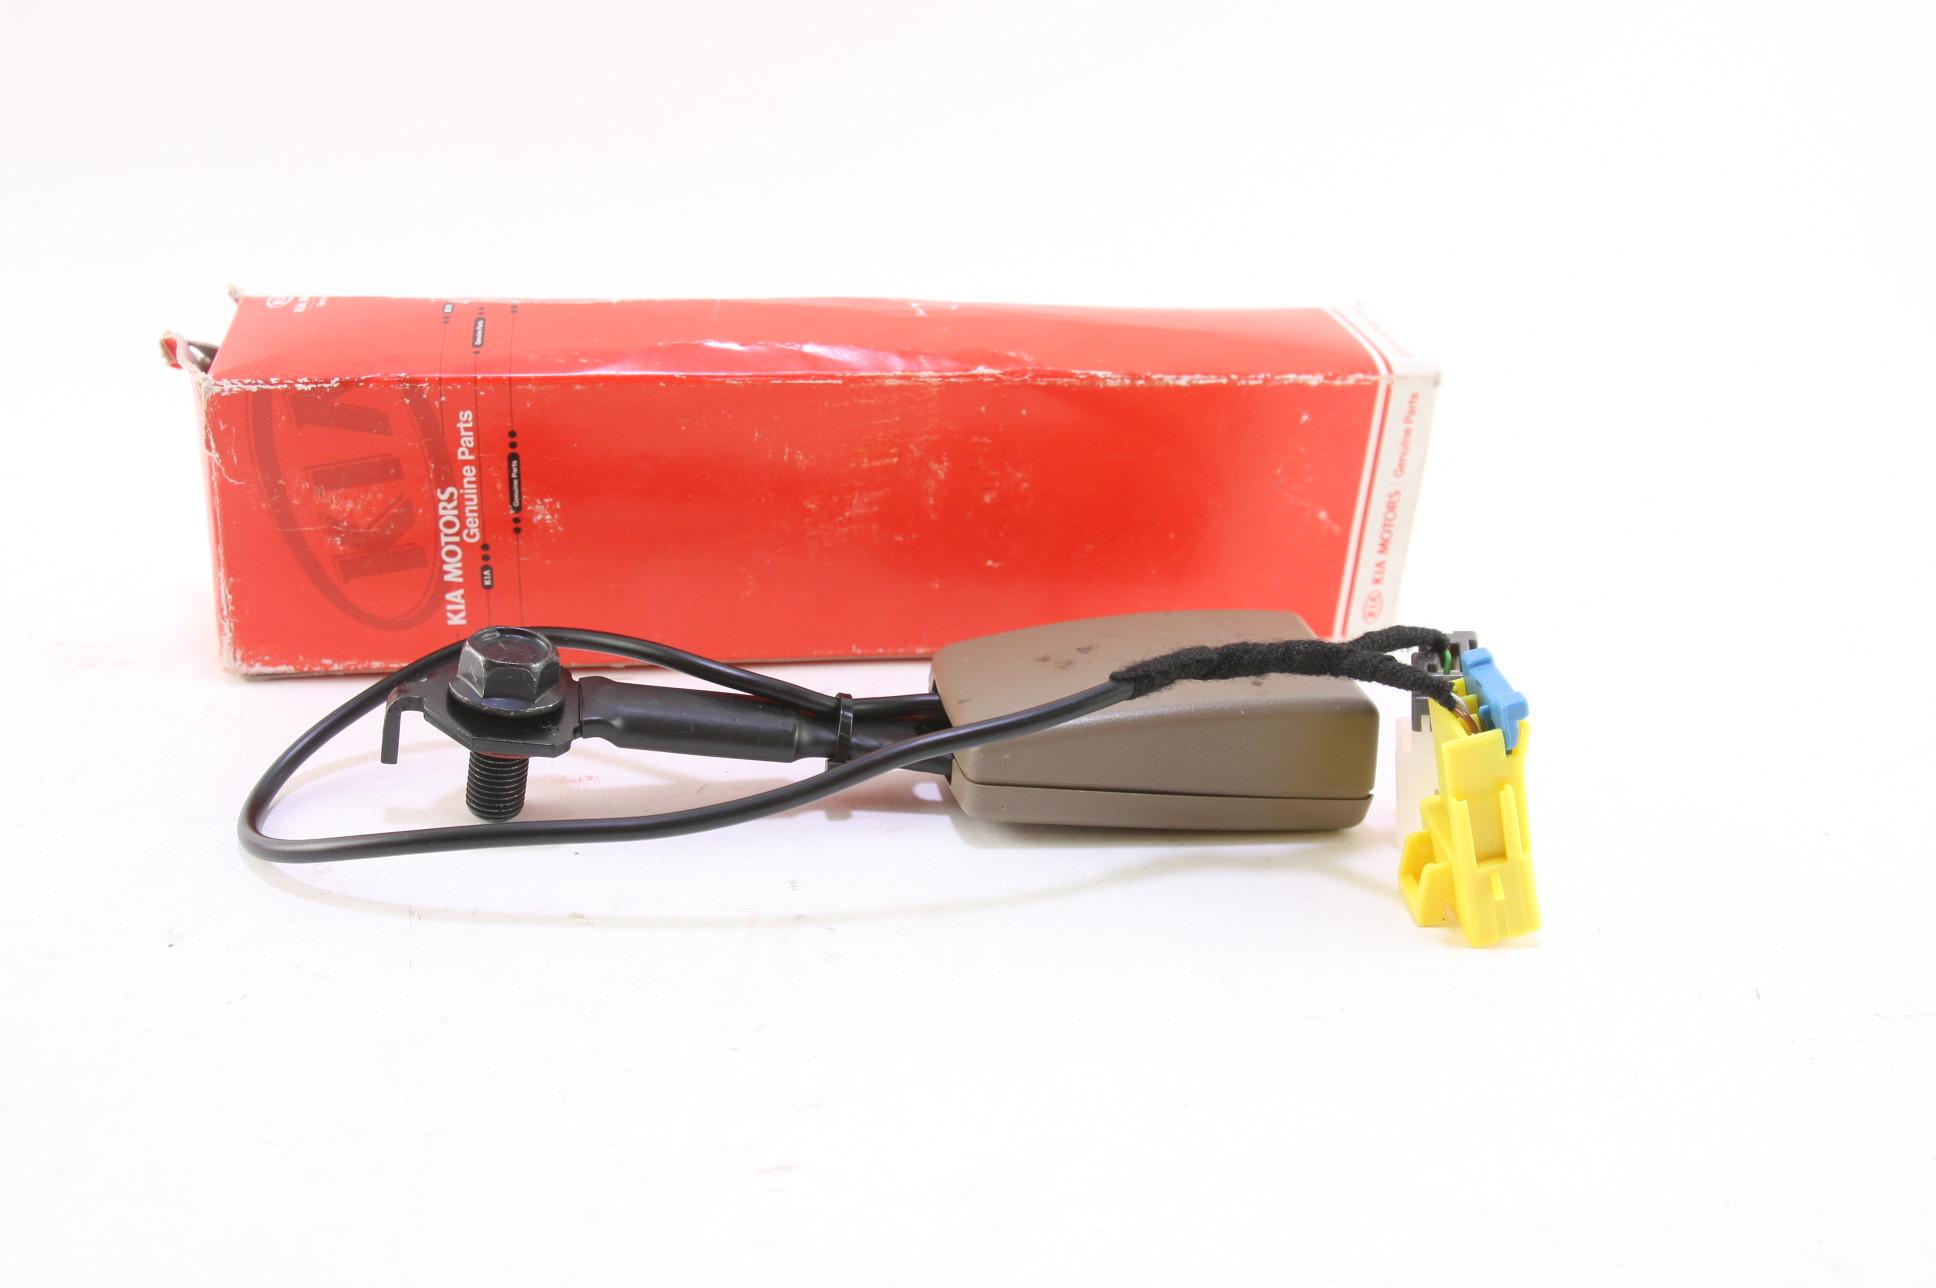 **New Kia OEM K52Y57712EBT 02-03 Sedona Front Seat Belt Buckle LH Free Shipping - image 1